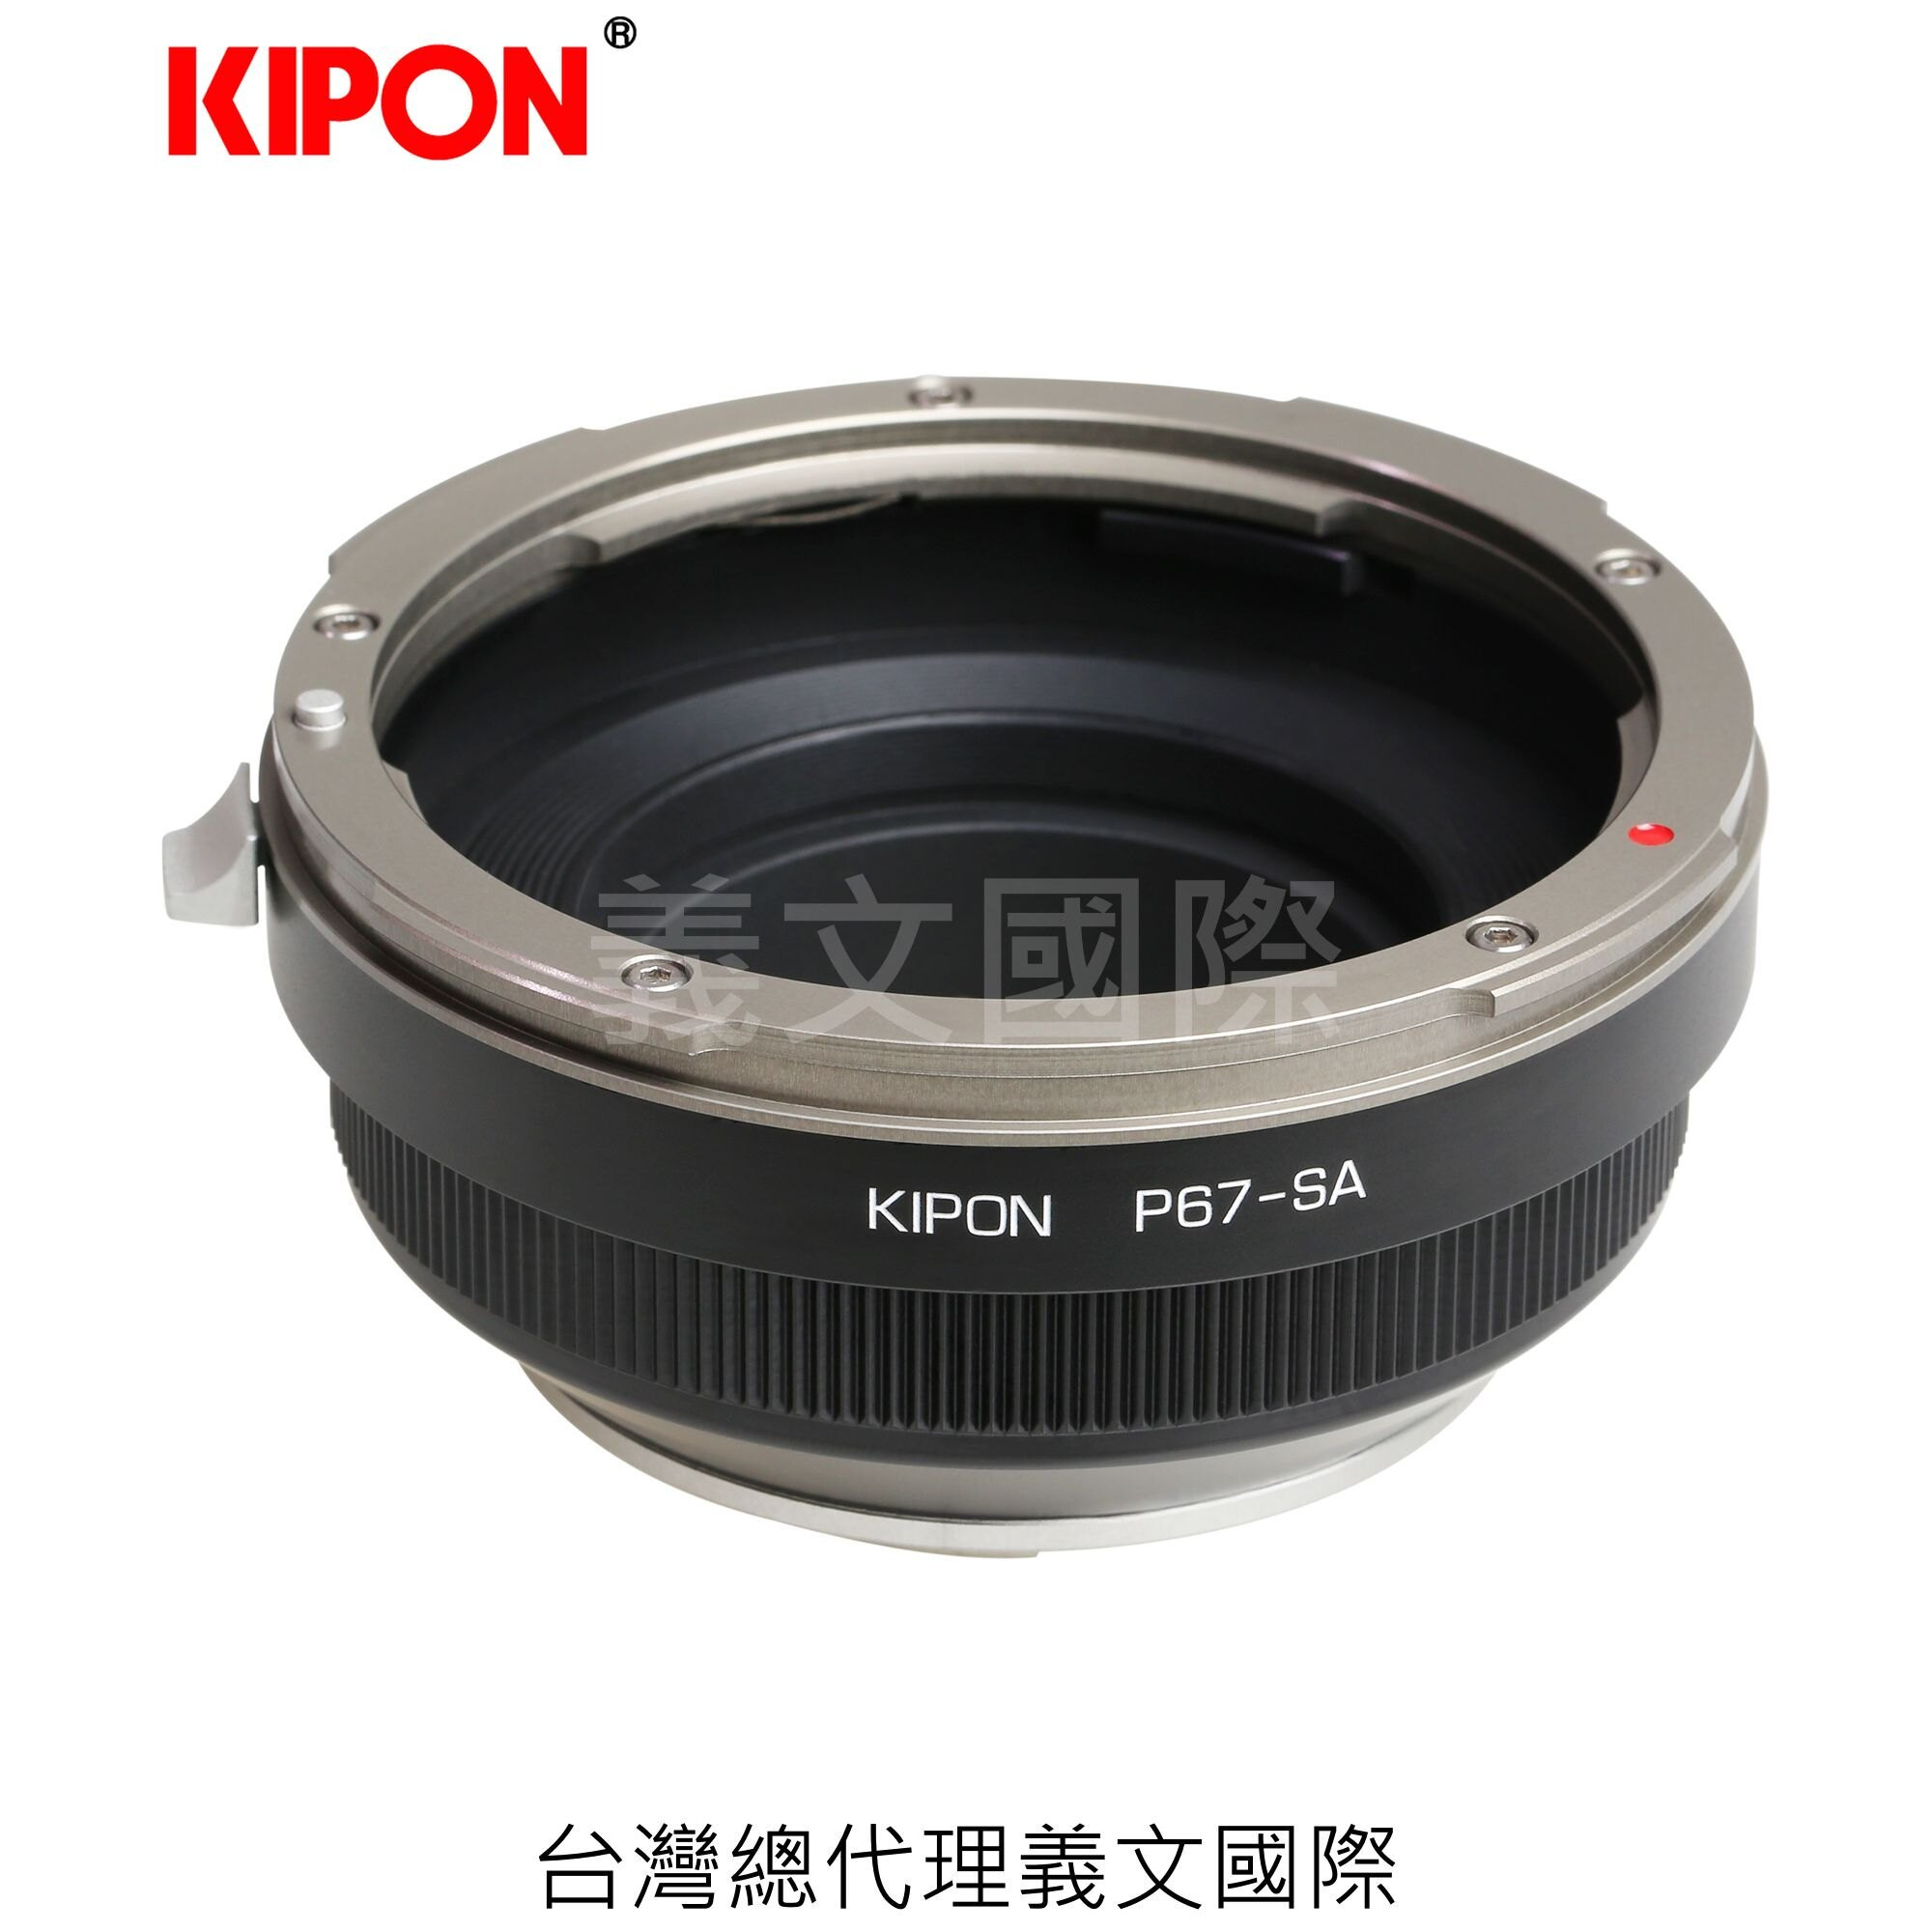 Kipon轉接環專賣店:P67-SA(Sigma,適馬,PENTAX 67,賓得士,SD1,SD10,SDQ,SDQH)